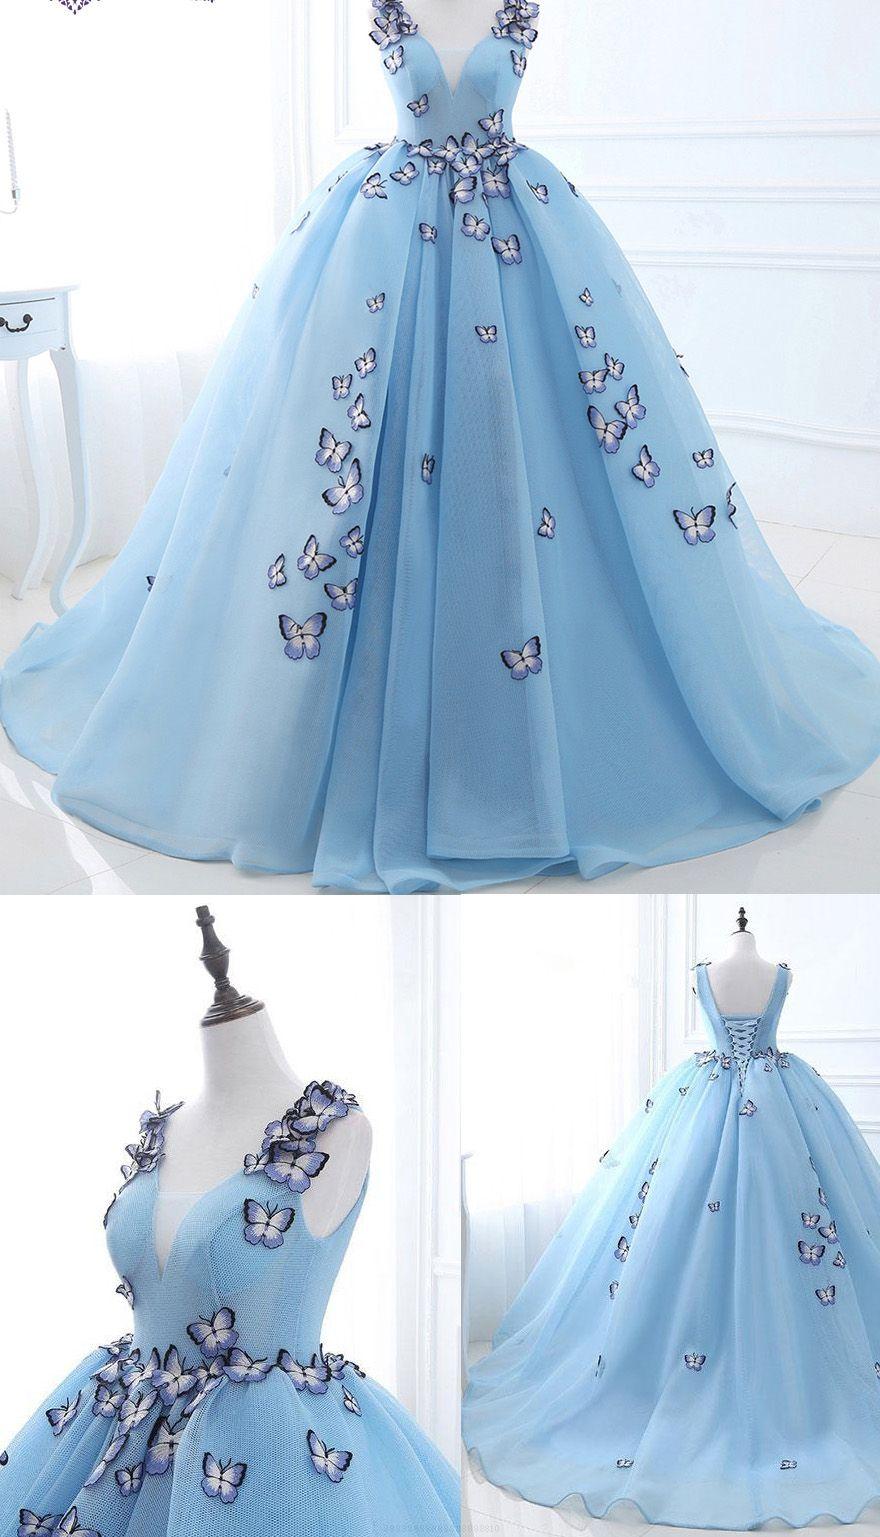 Gown Wedding Dresses, Blue Wedding Dresses, Long Wedding Dresses ...